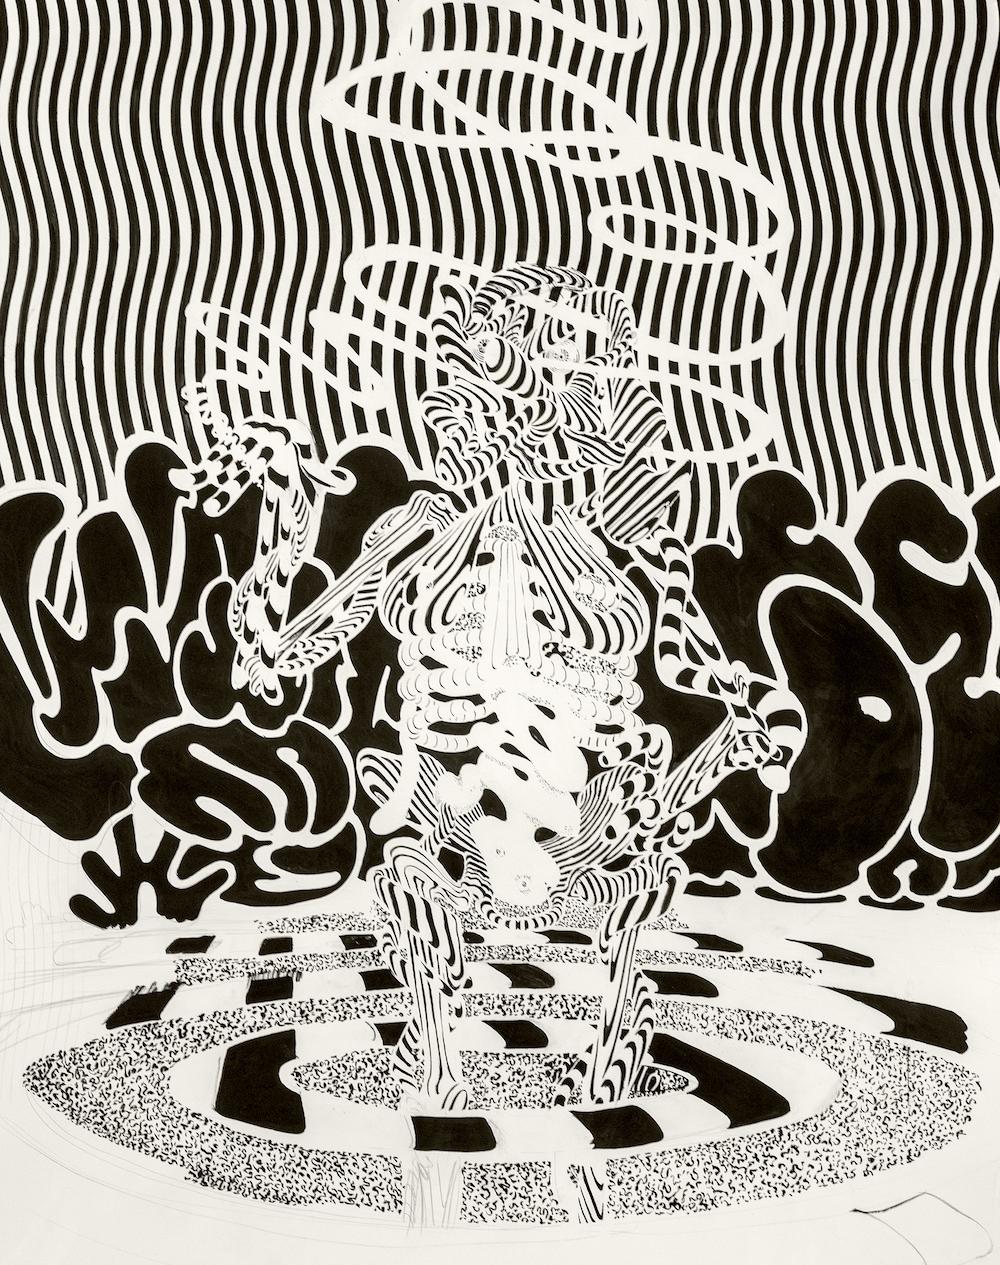 Larry Bob Phillips (Smoking Bather) 2015. Ink on paper. 44%22 x 67%22.jpg